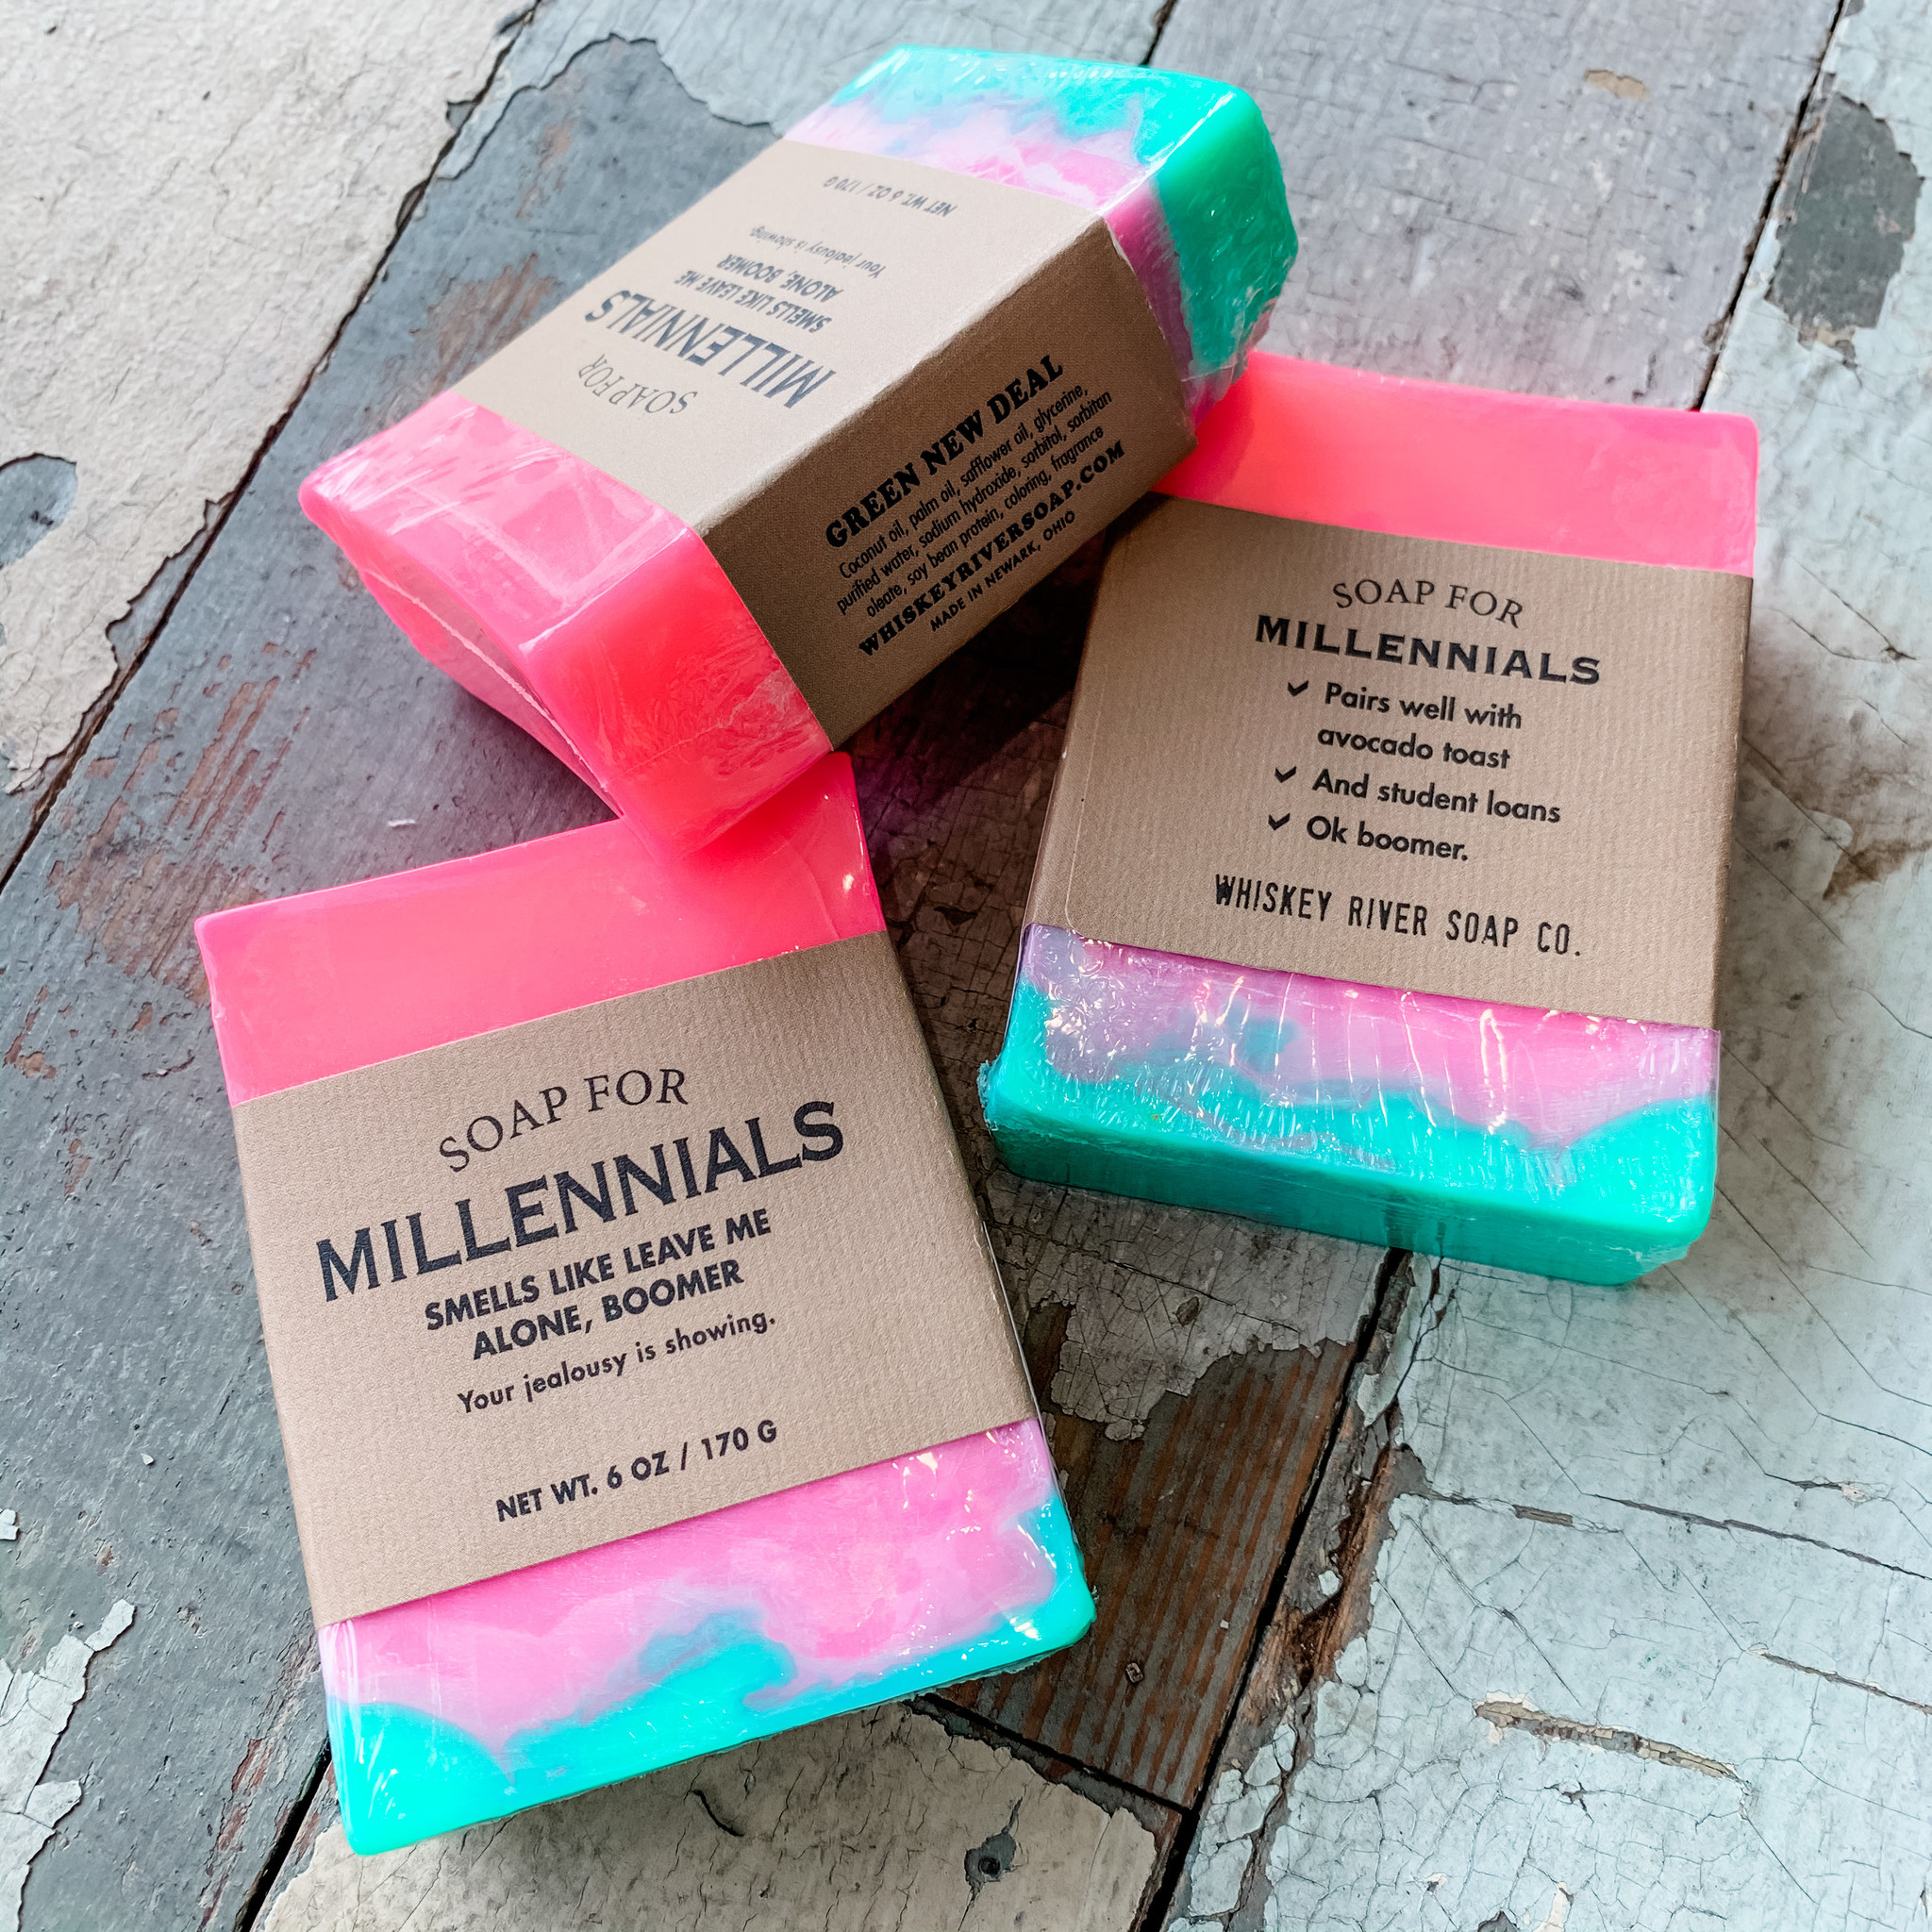 Whiskey River Soap Company Whiskey River Soap Millennials